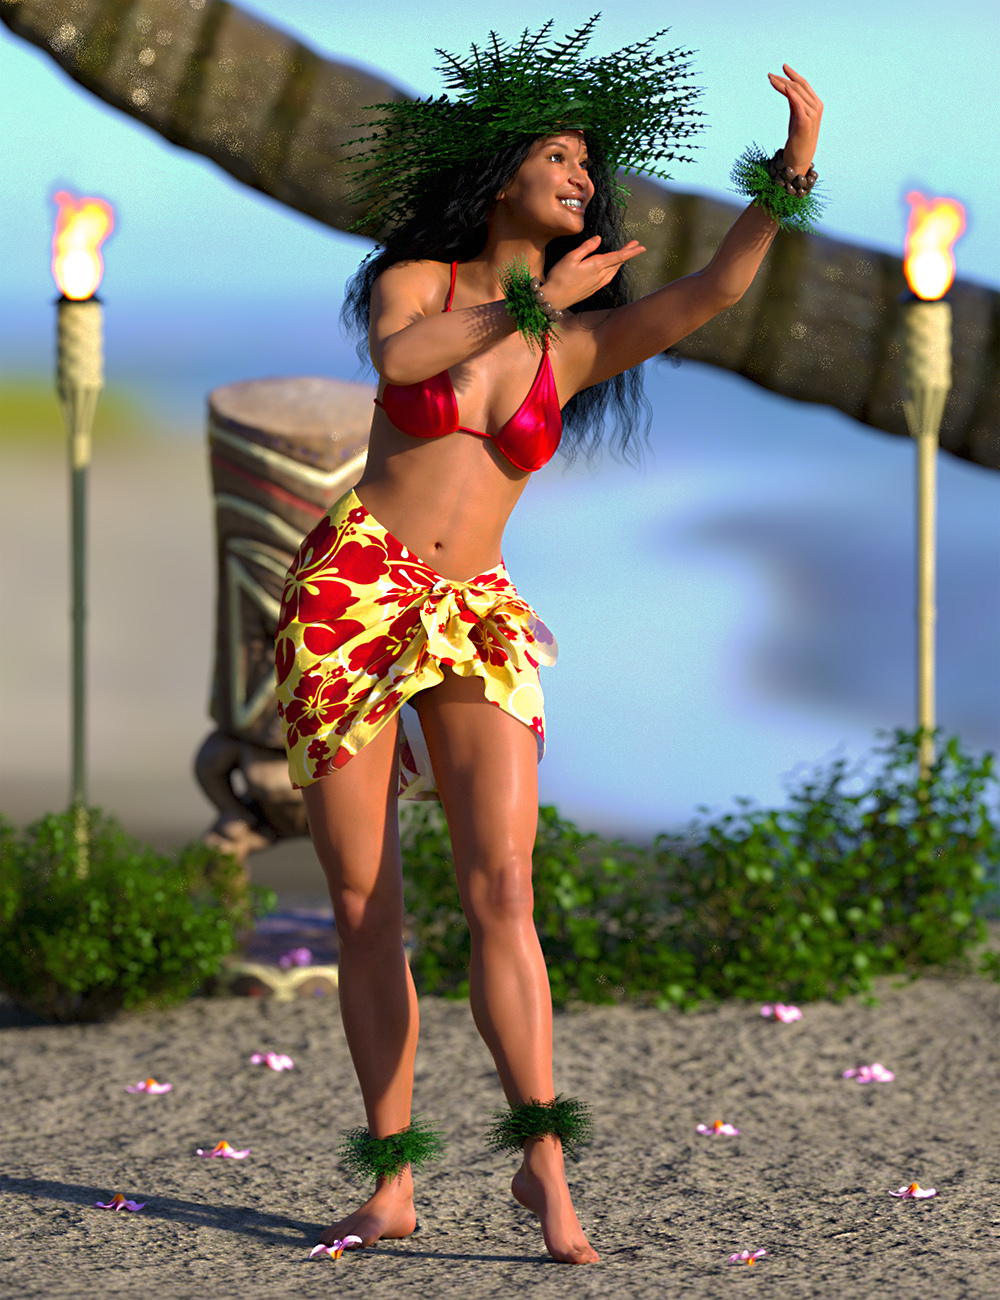 IGD Mea Hula Poses for Genesis 8 Female by: Islandgirl, 3D Models by Daz 3D